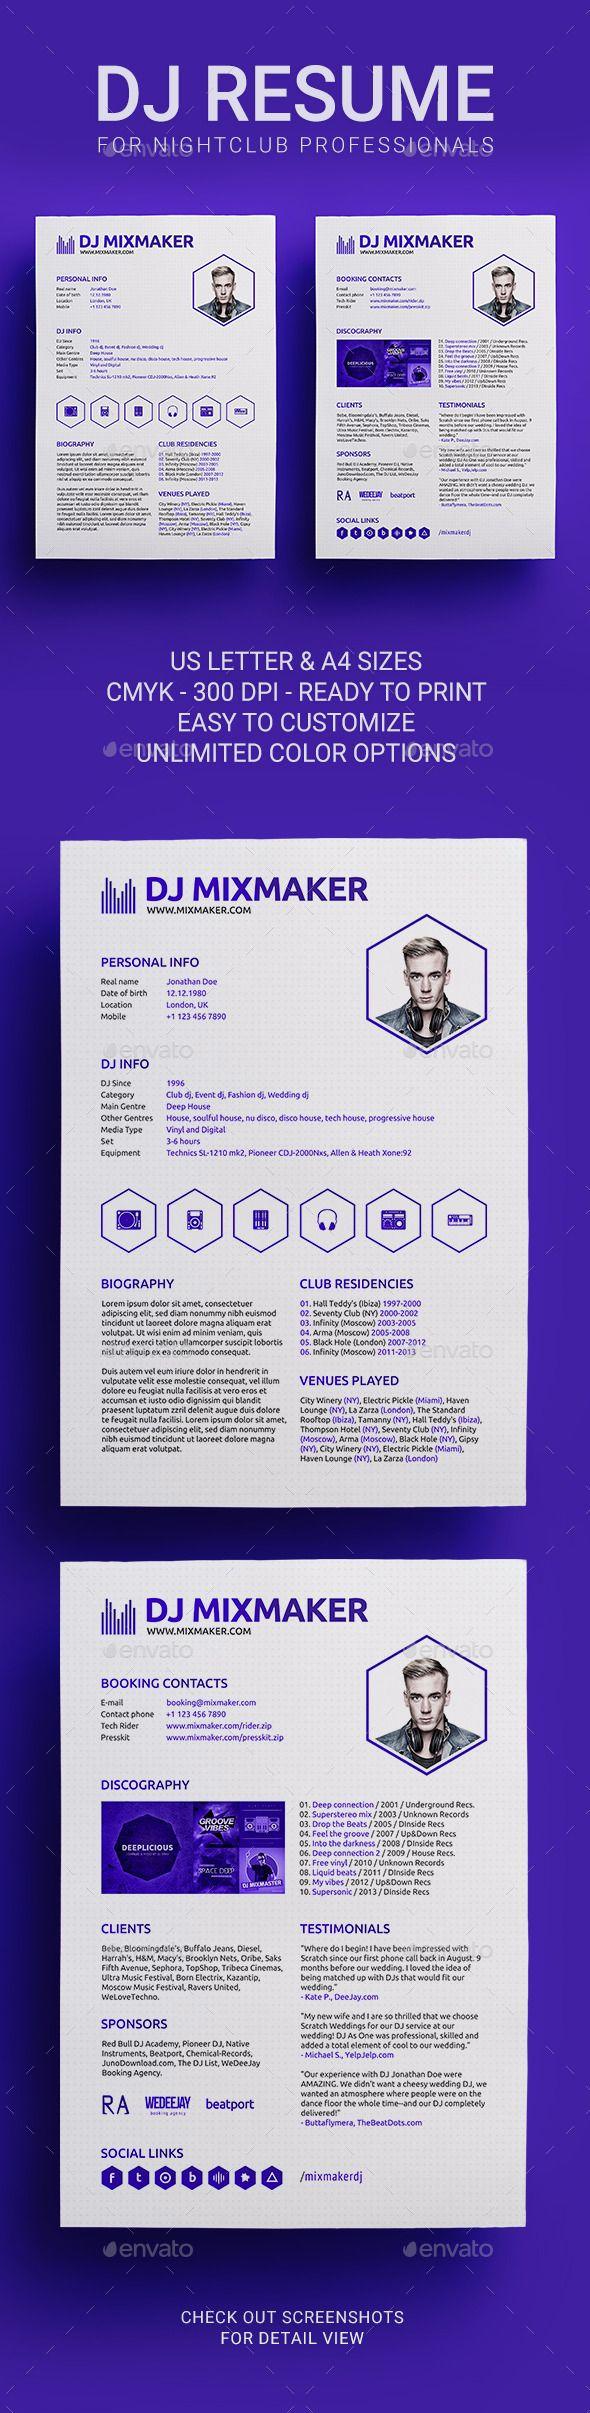 Mixmaker Dj Resume Press Kit Psd Template Press Kit Press Kit Design Press Kit Template